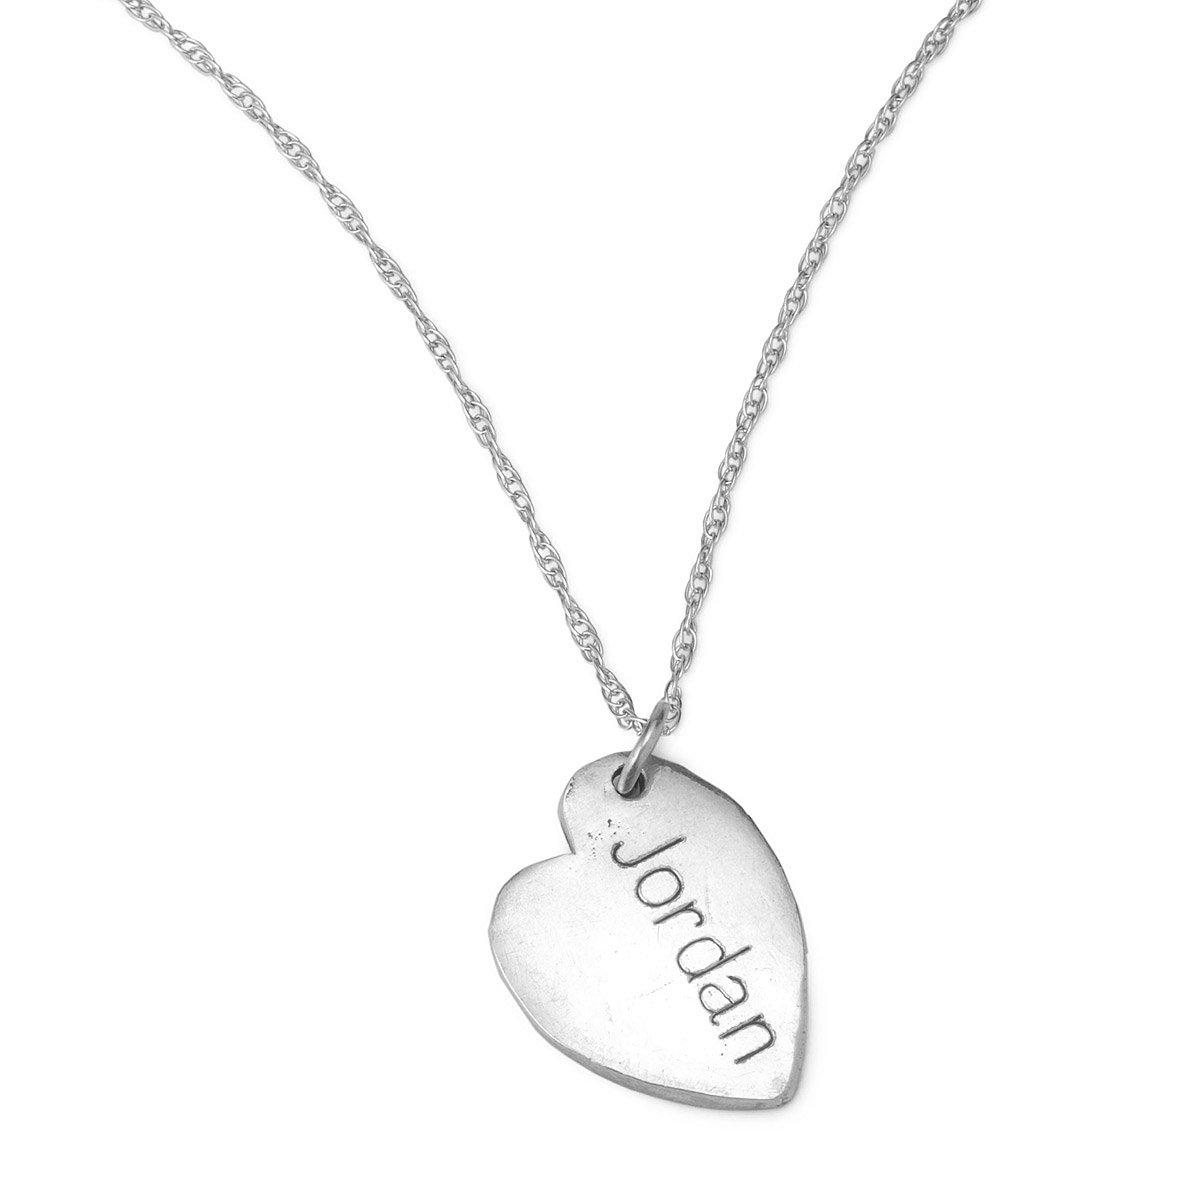 Custom fingerprint necklace personalized gift silver jewelry custom fingerprint necklace 2 thumbnail solutioingenieria Gallery